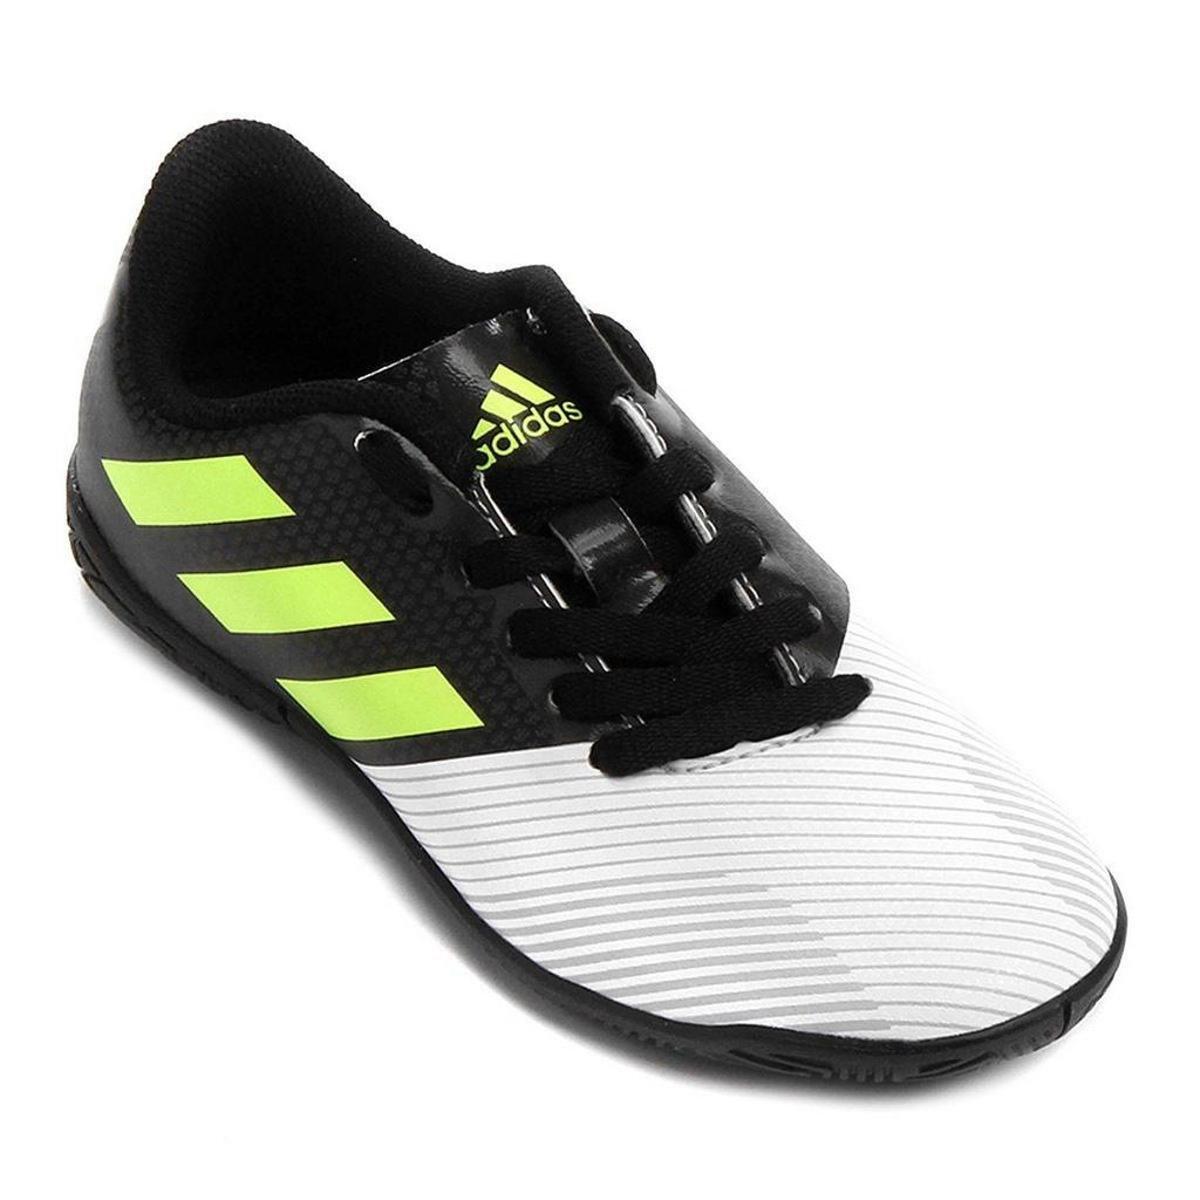 74b535c9f6 Chuteira Futsal Infantil Adidas Artilheira 17 IN